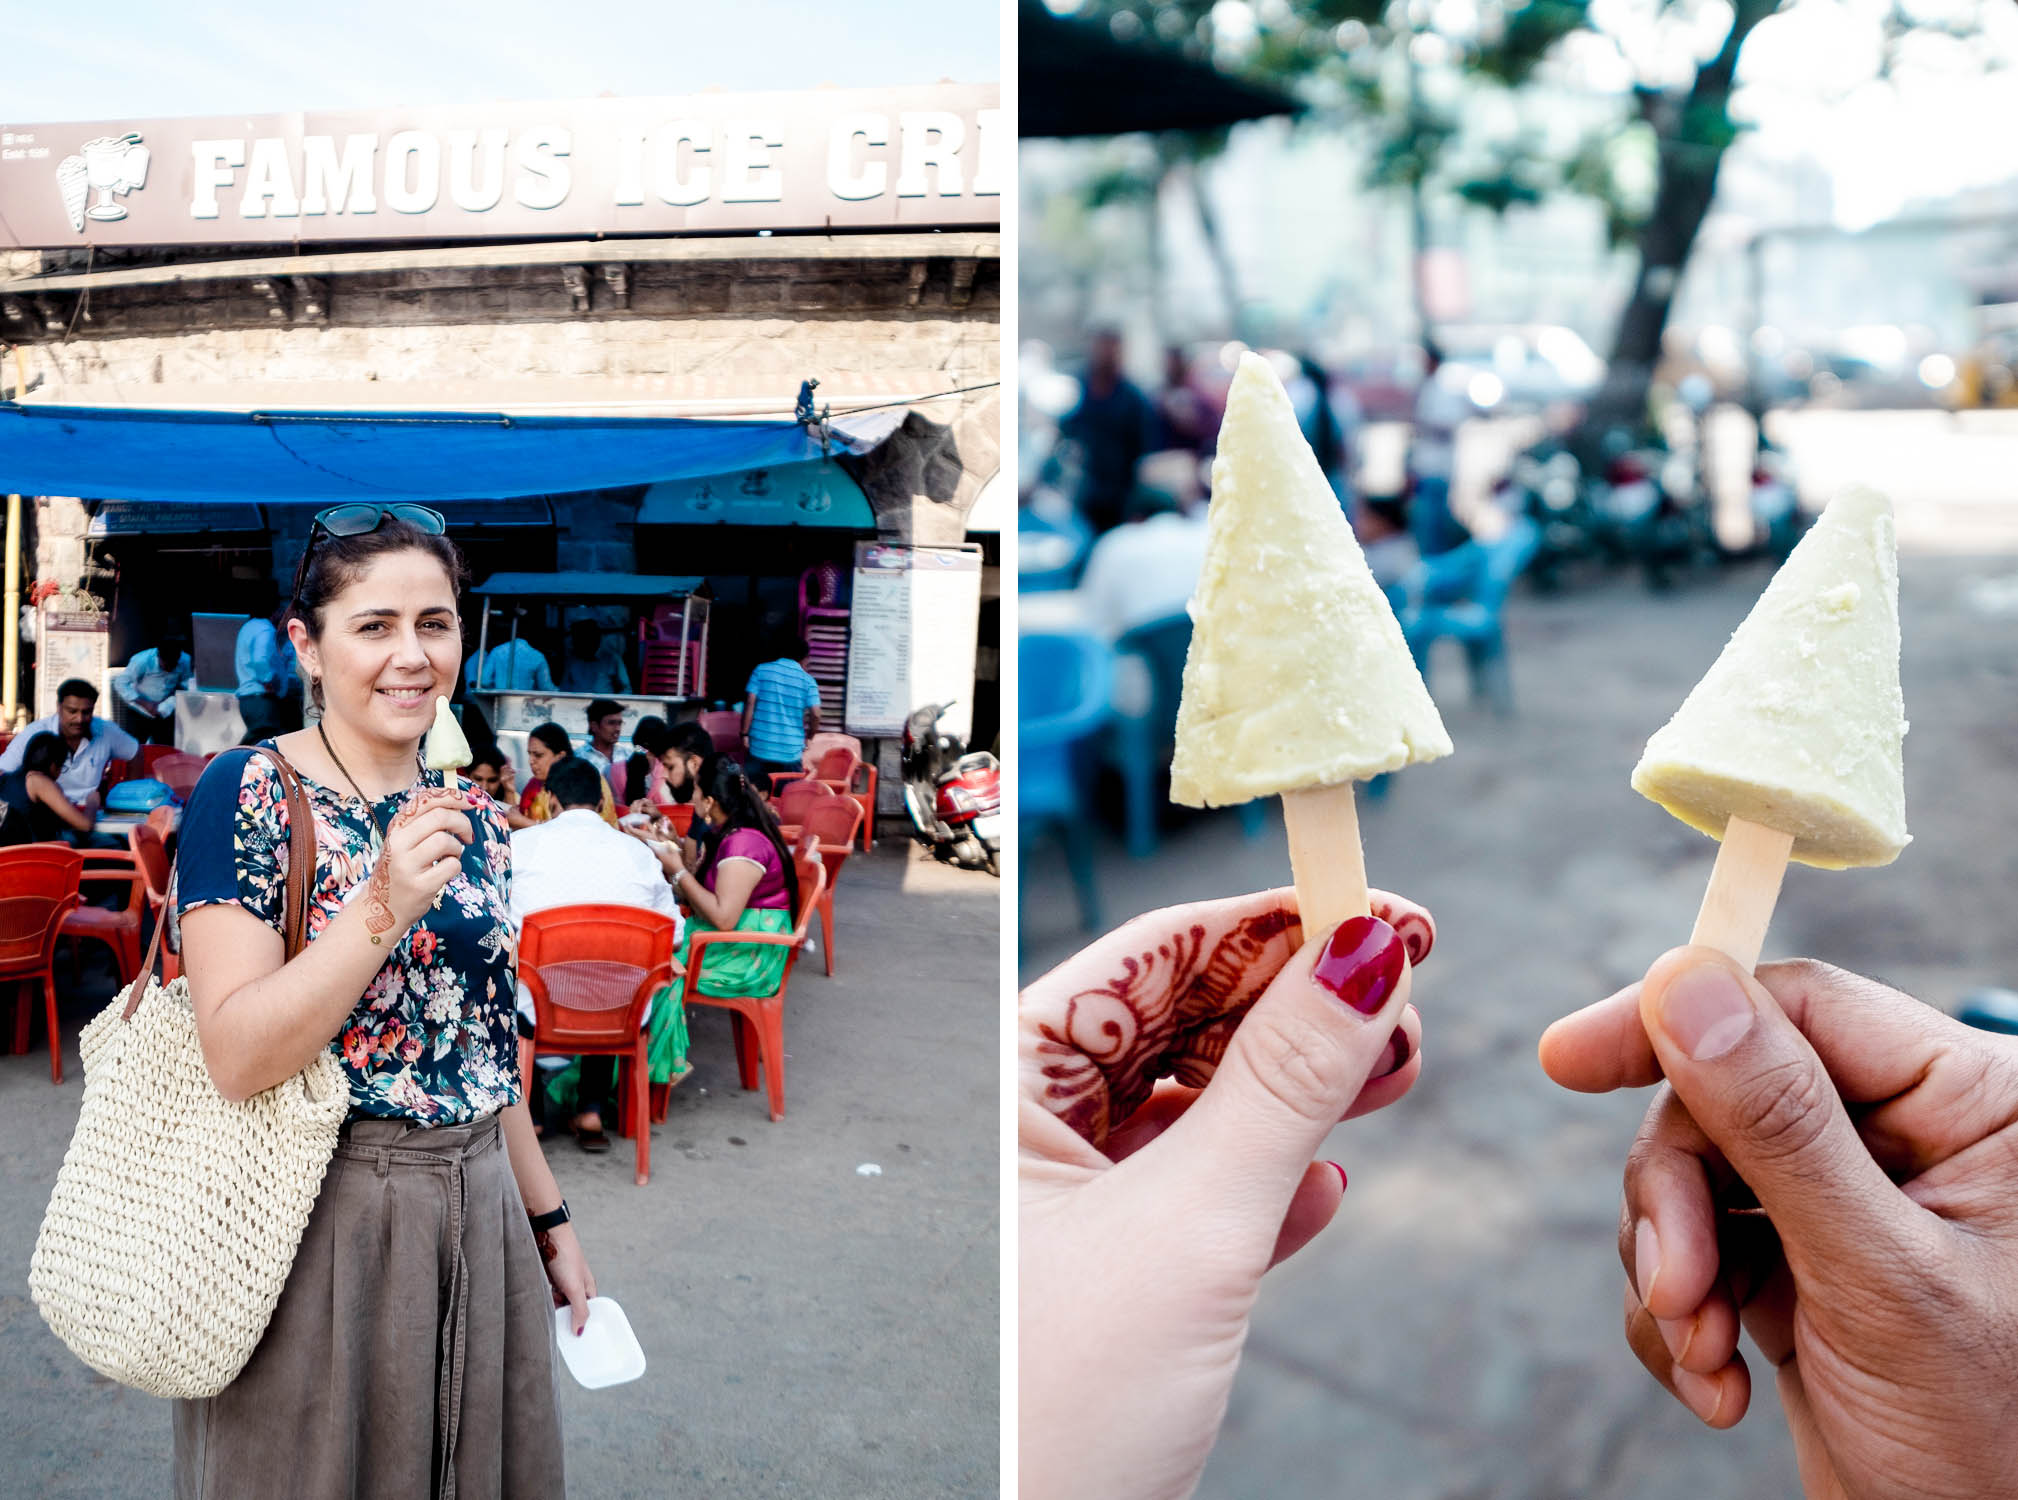 Famous Ice Cream in Hyderabad, India | Food Sherpa Trail with ITC Kakatiya Hotel